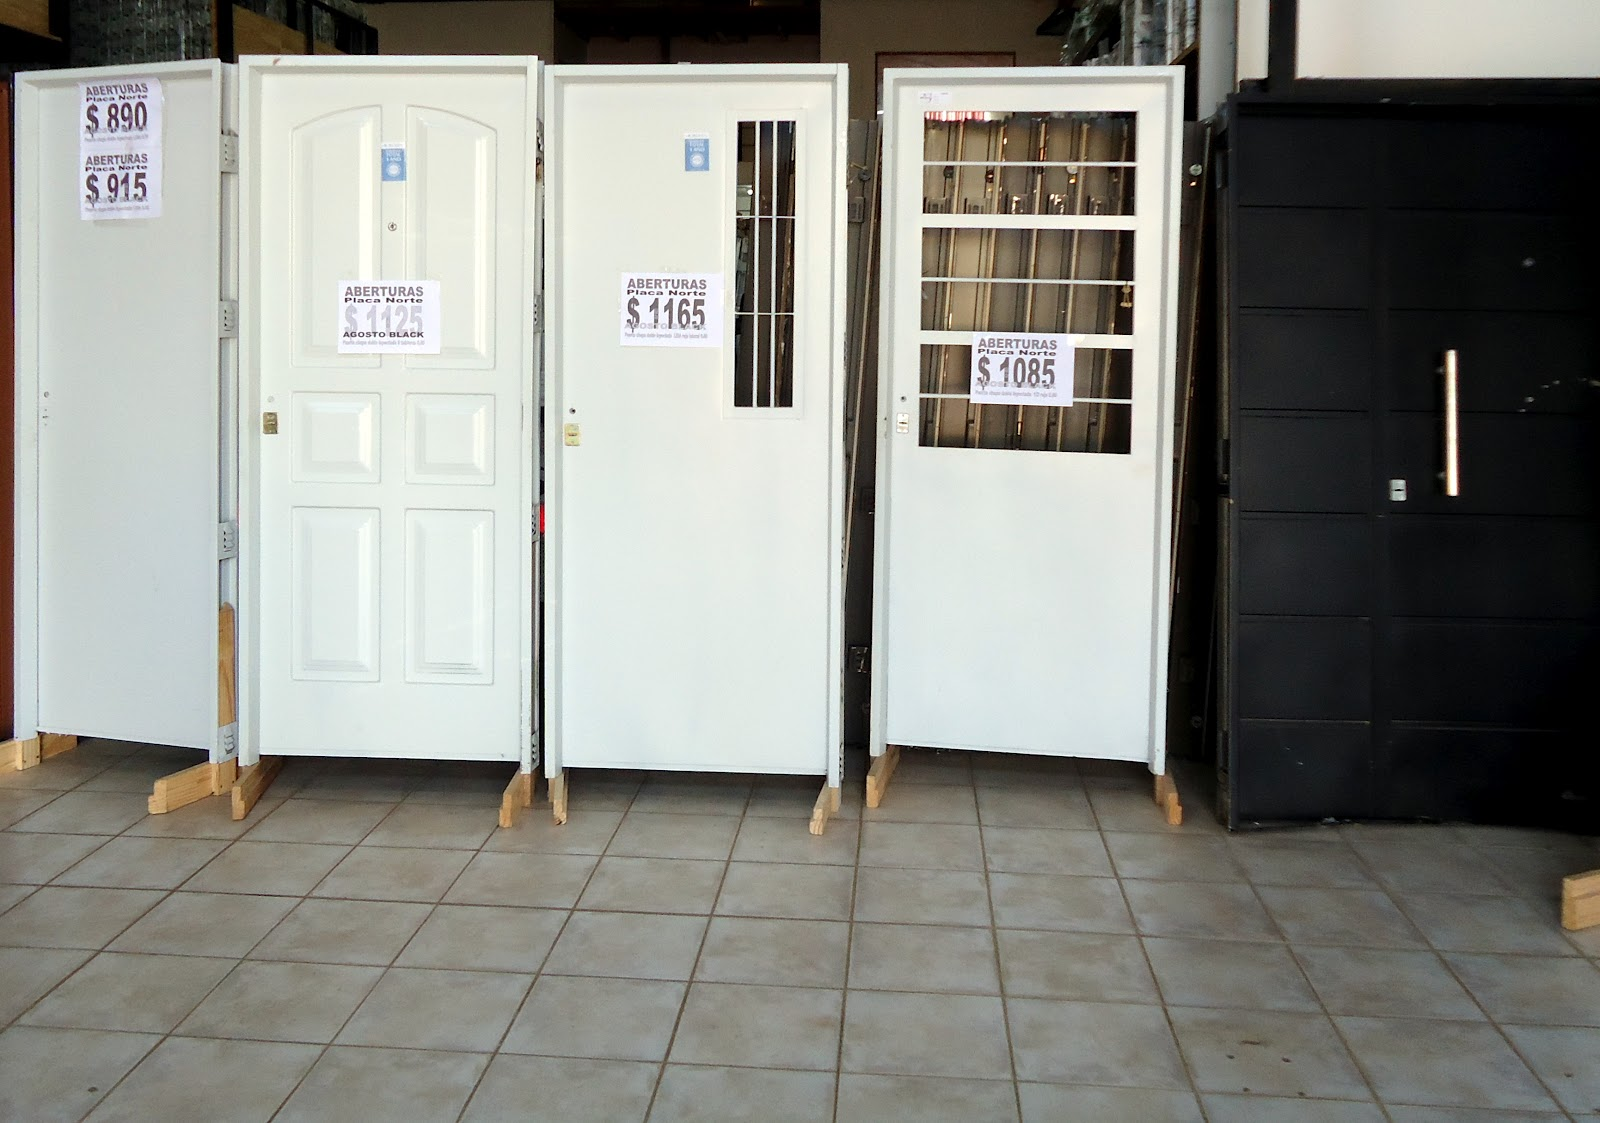 Puertas doble chapa inyectadas aberturas placa norte for Puertas de chapa para exterior